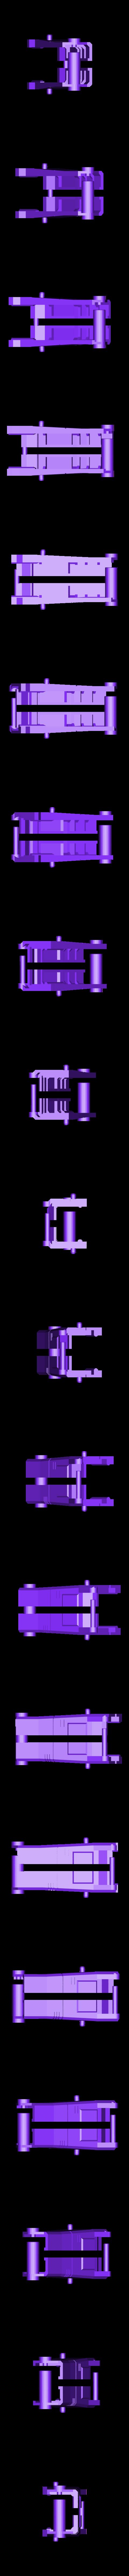 Thighright1.stl Download STL file KO TFC Uranos Upgrade Kit IDW Ver • 3D printer object, Toymakr3D